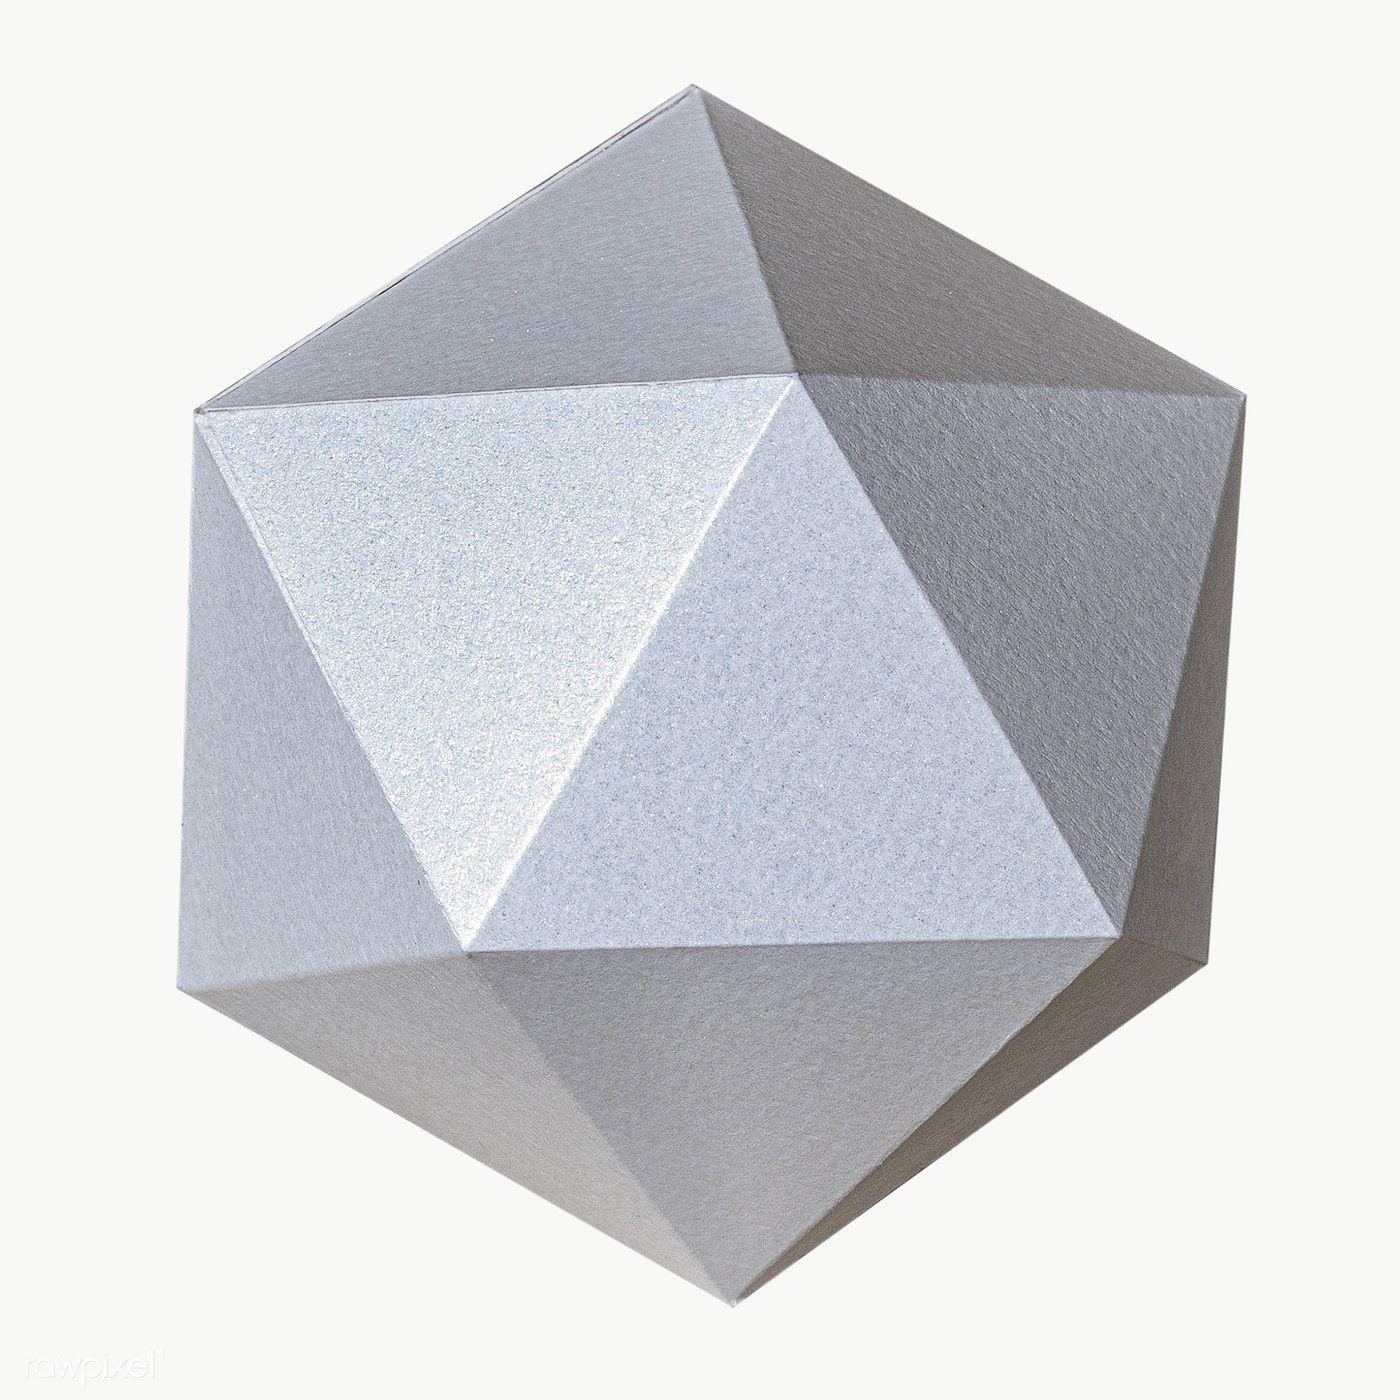 3d Gray Pentagon Paper Craft Design Element Free Image By Rawpixel Com Jira Paper Crafts Design Element Design Crafts